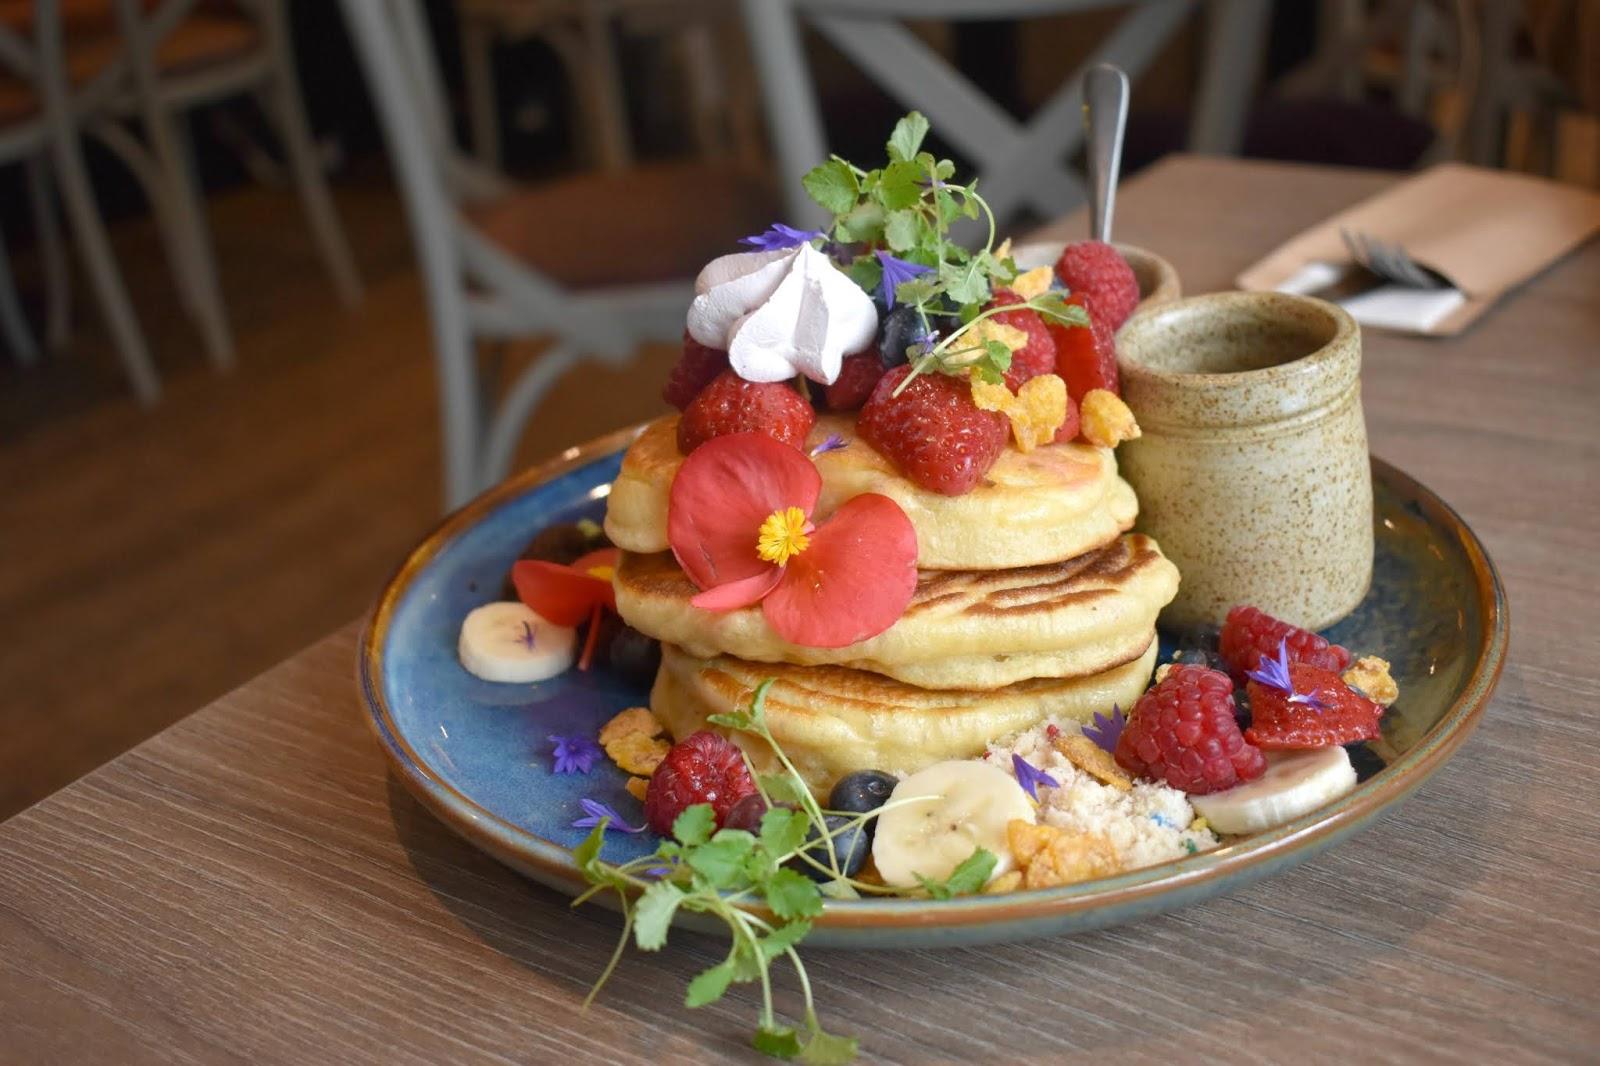 Exploring Harrogate - Breakfast at The Wild Plum